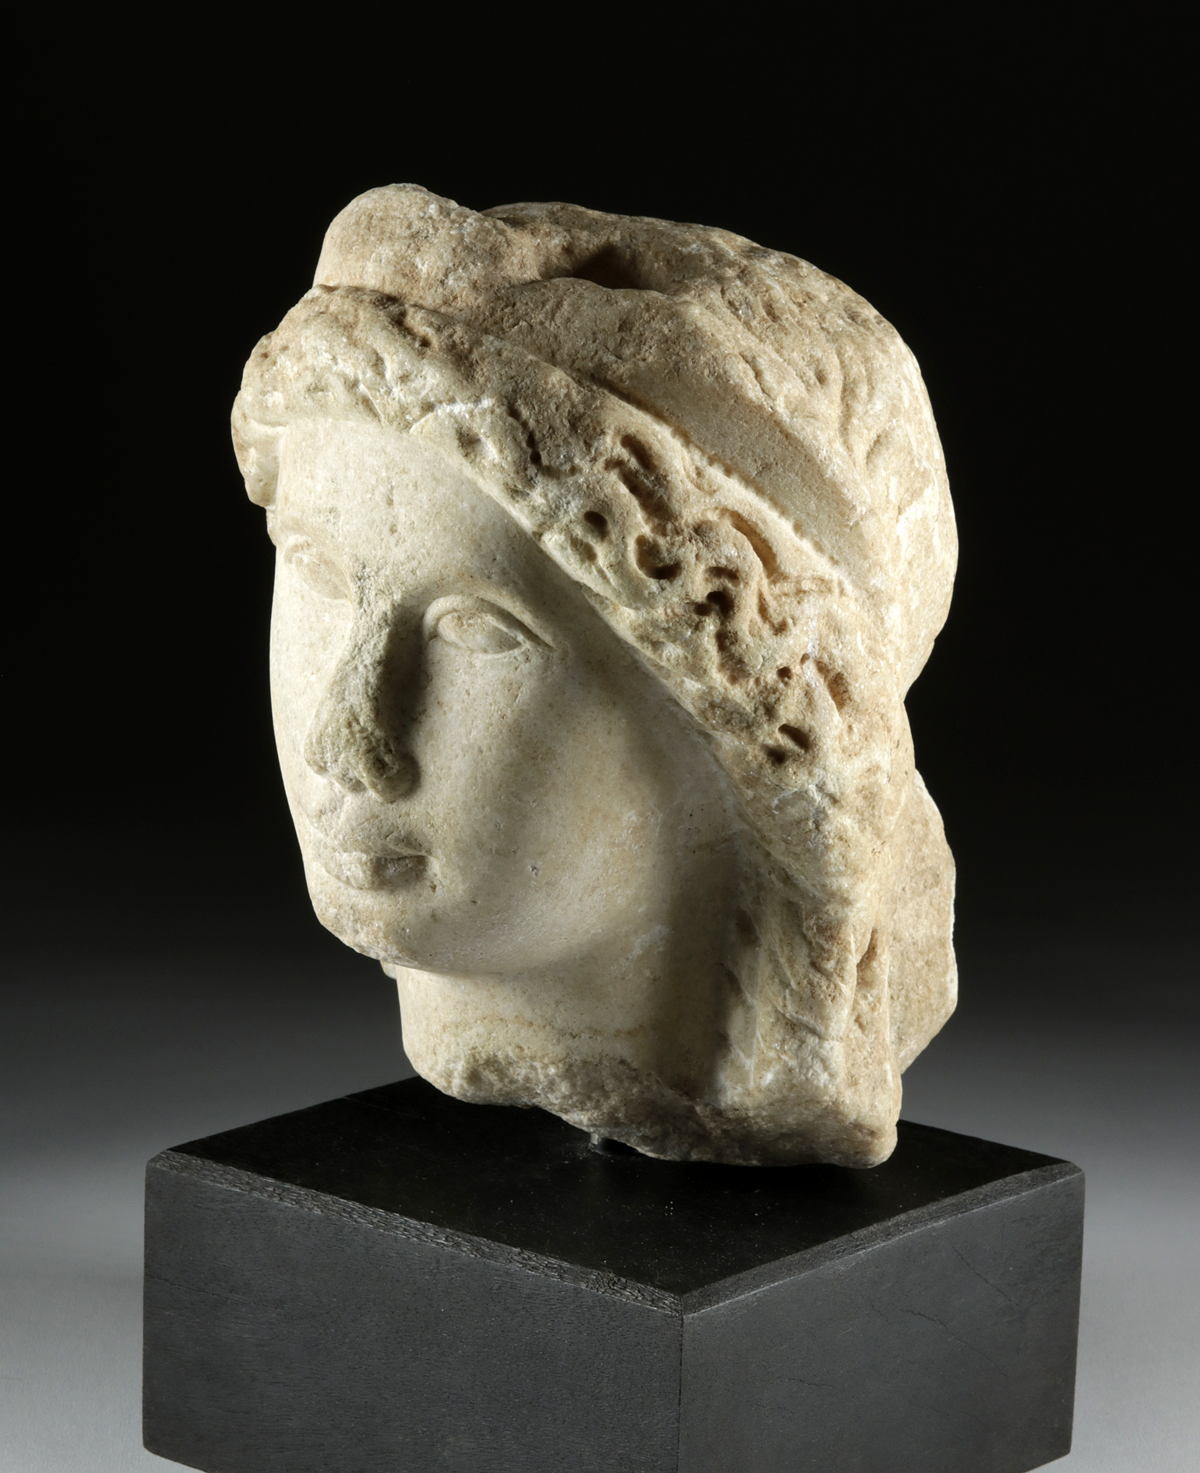 Lot 19 - Romano-Egyptian Marble Head, ex-Sotheby Parke-Bernet